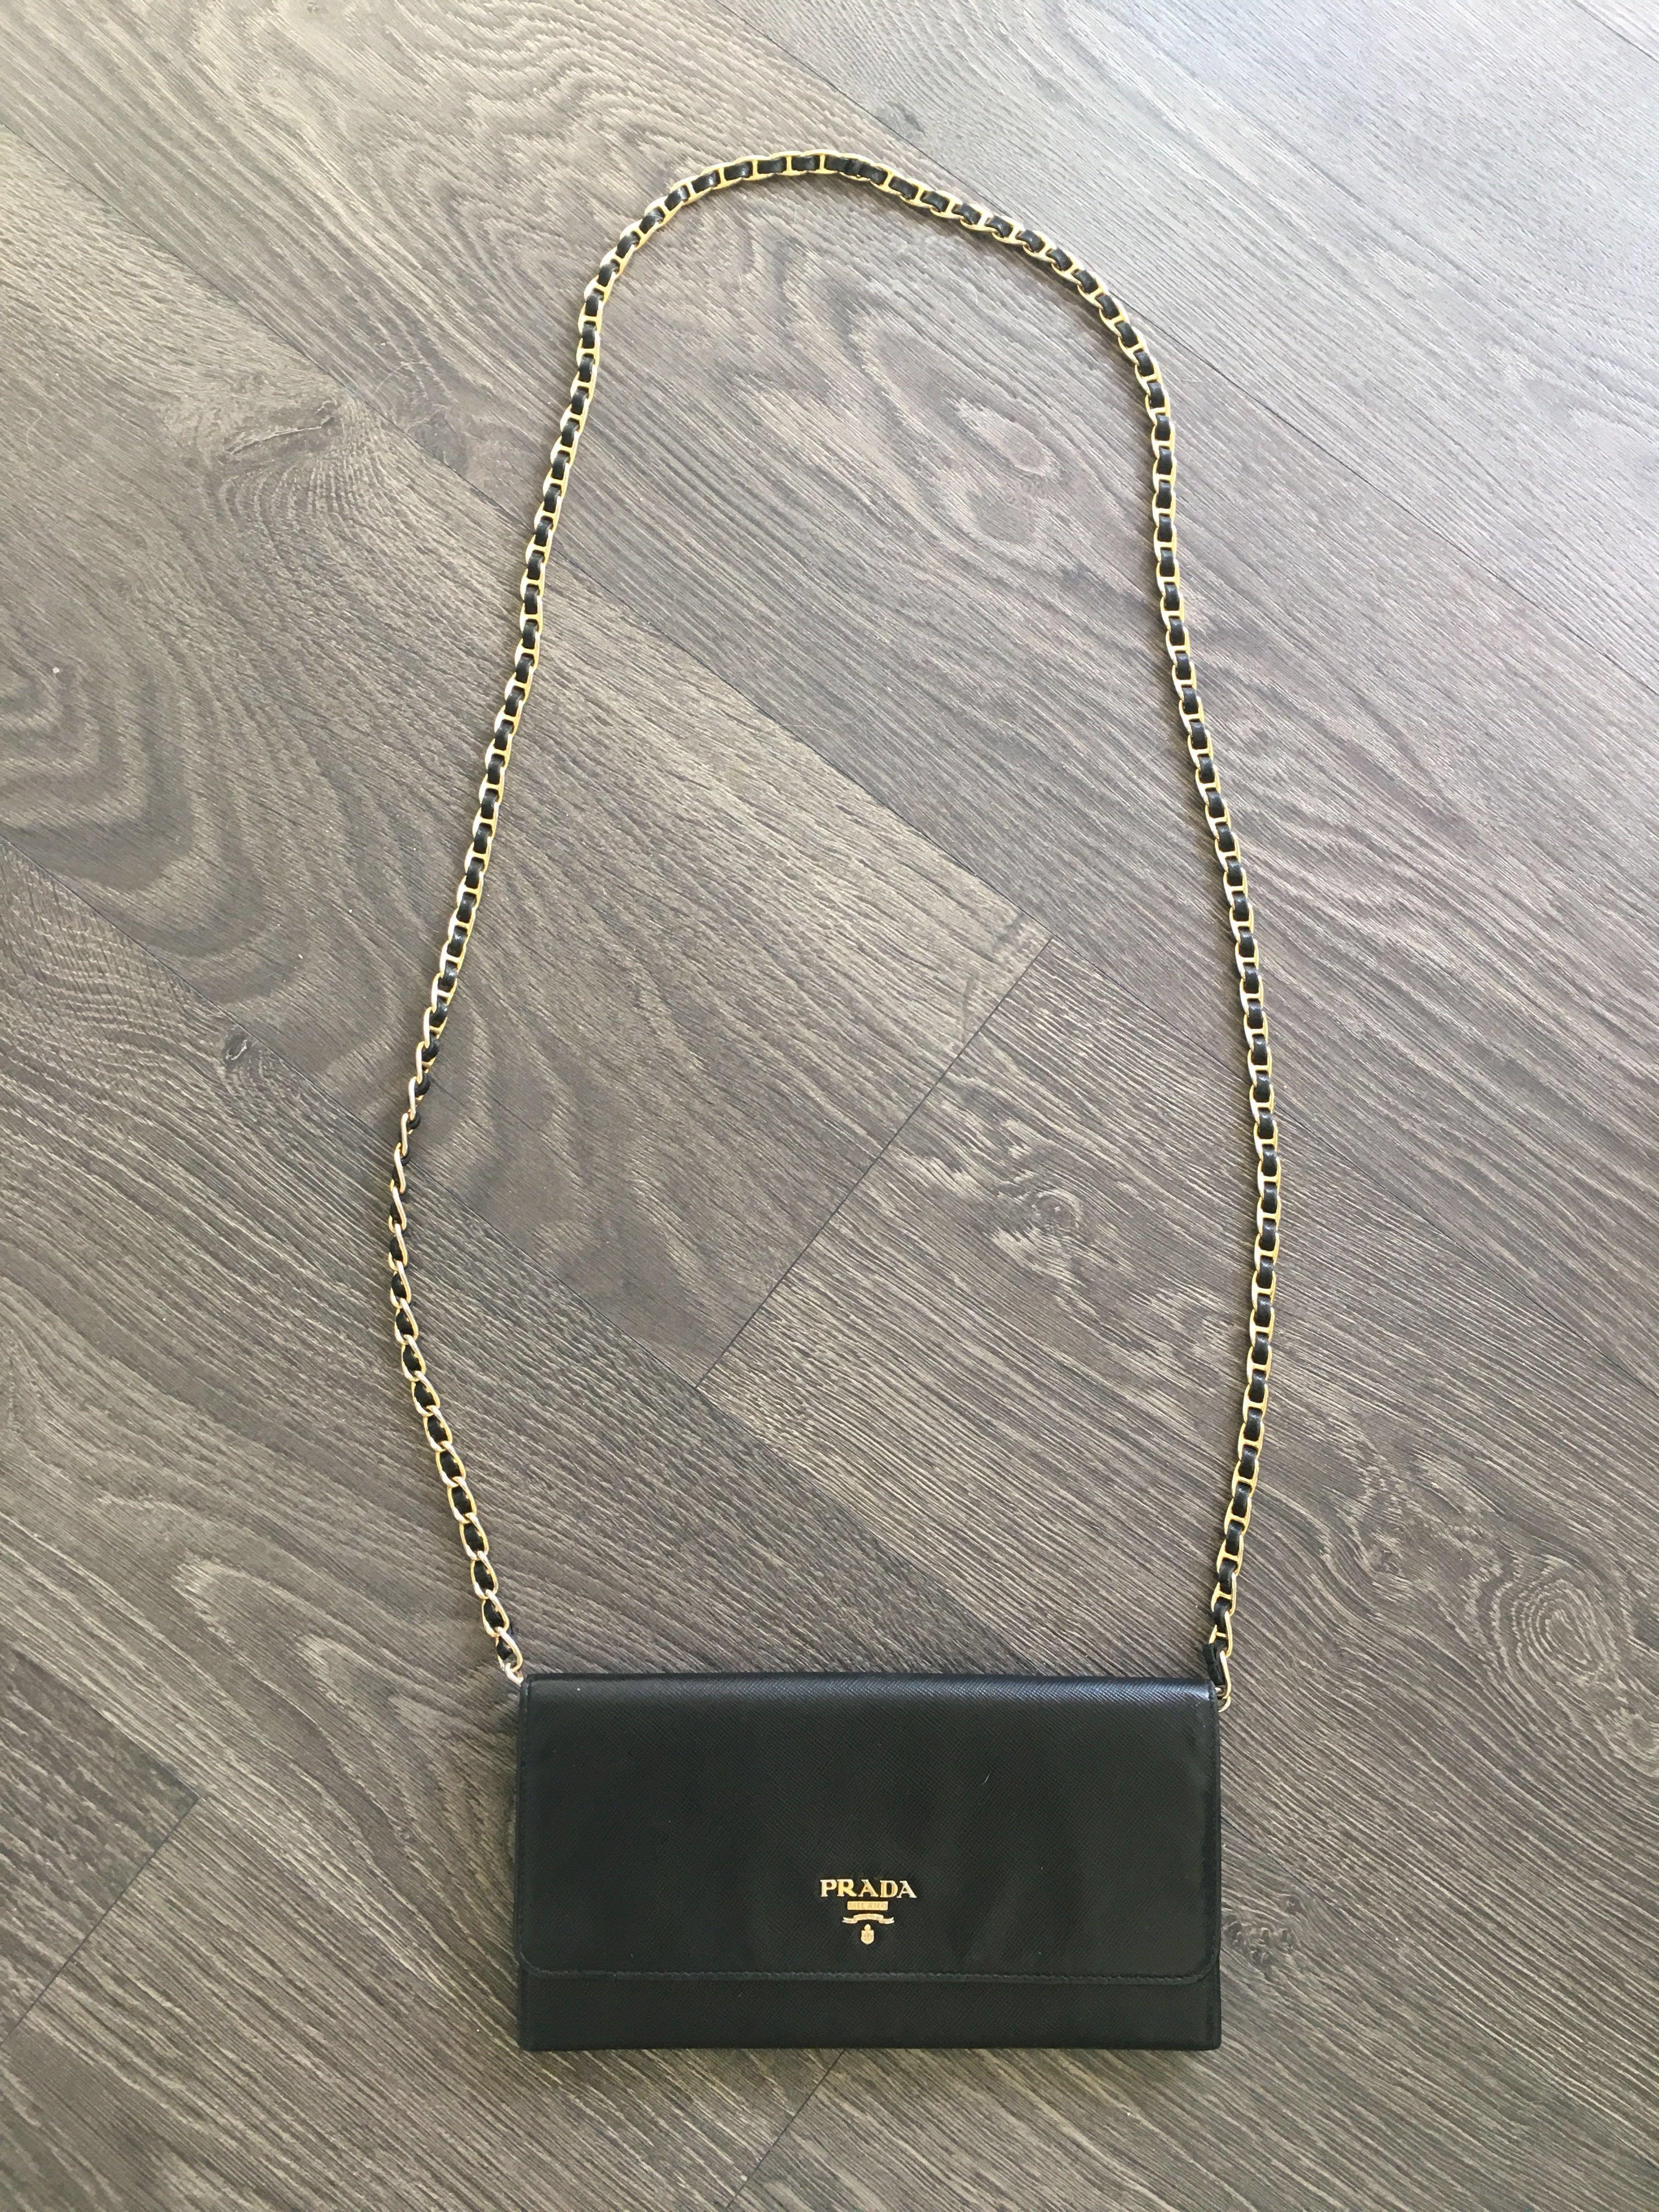 100% Authentic Prada Saffiano Wallet on Chain in Black